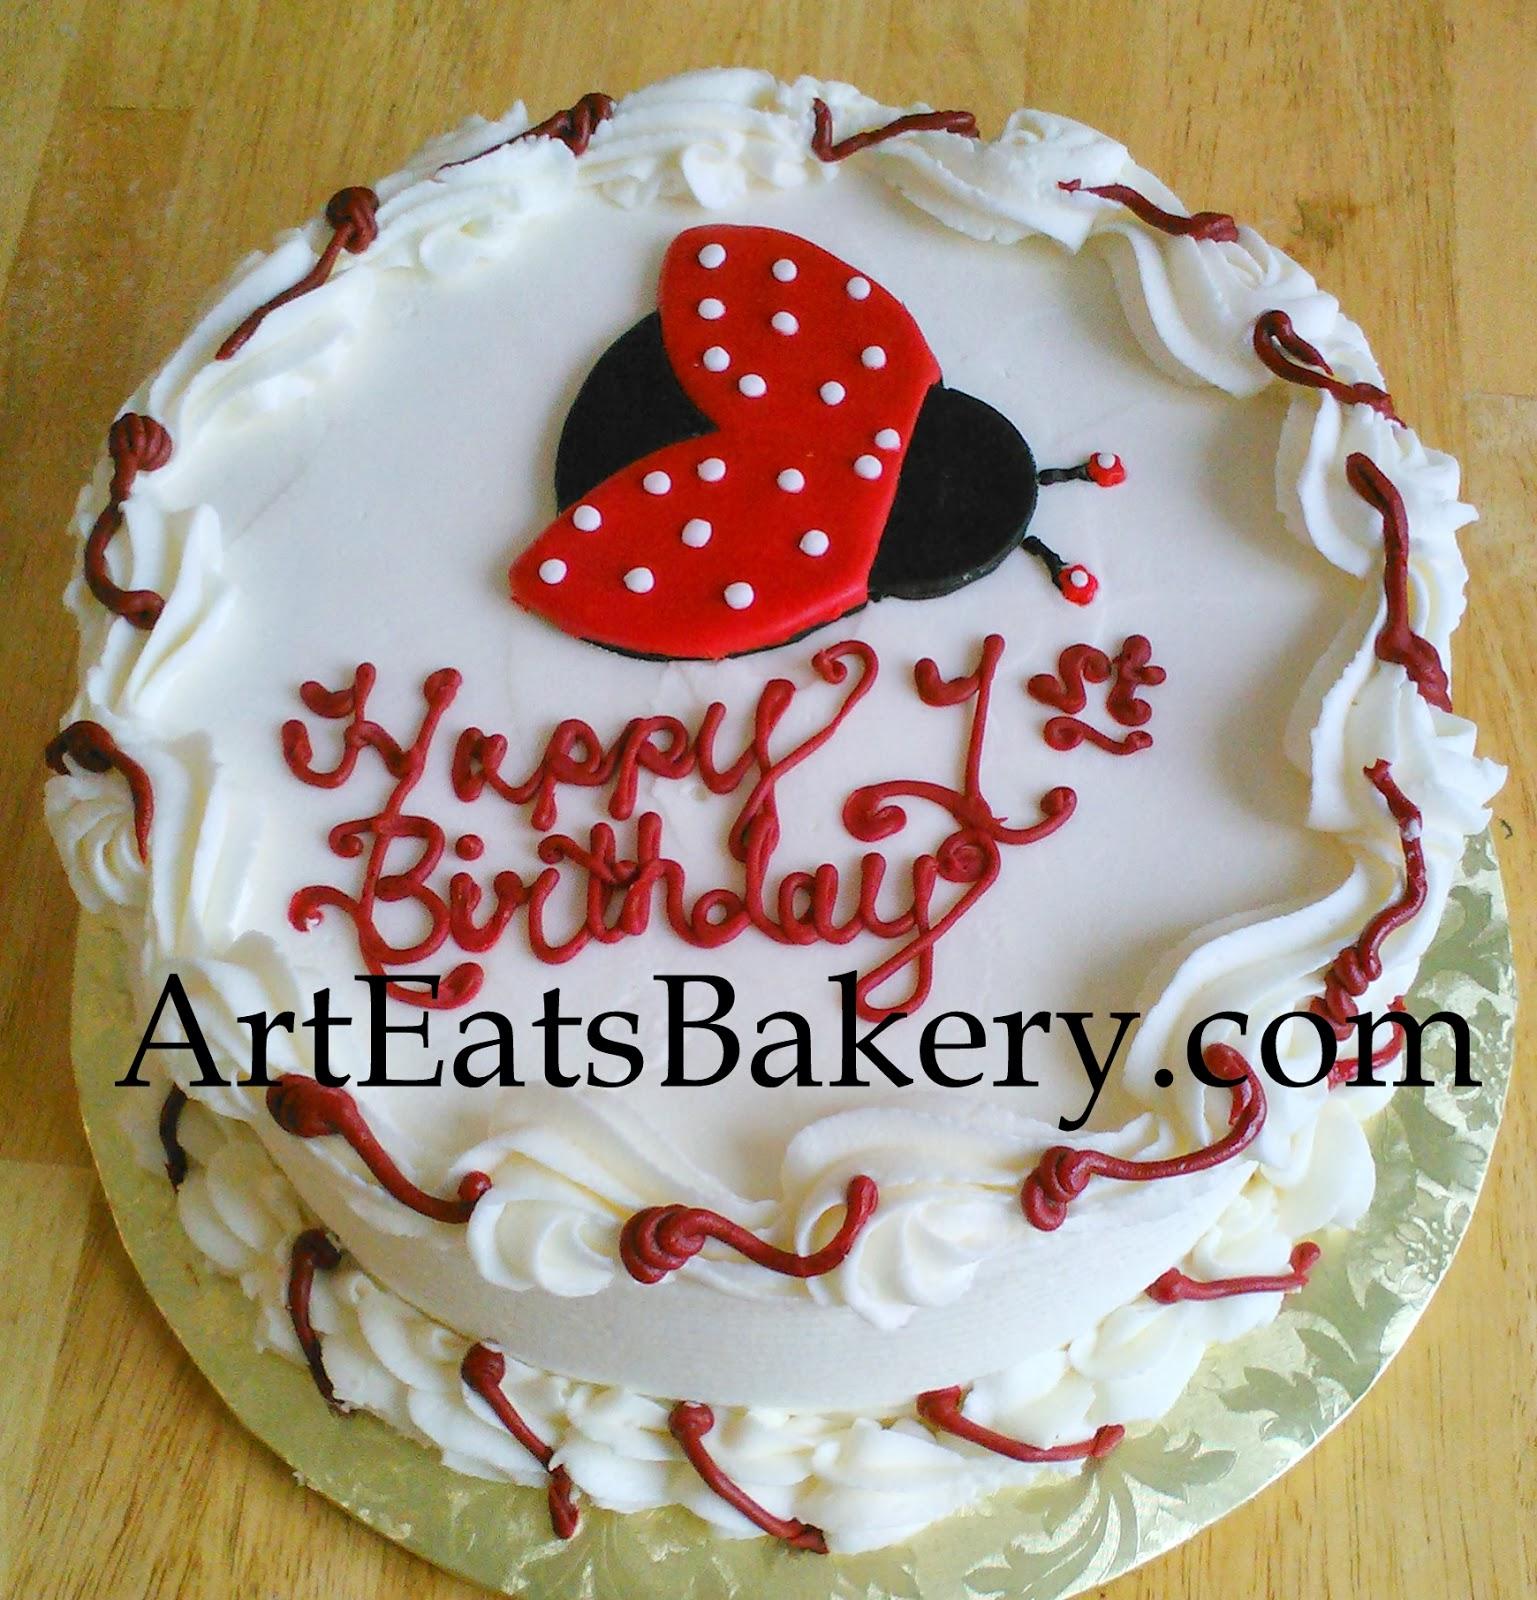 Red And Black Wedding Cakes Ideas: Art Eats Bakery Custom Fondant Wedding And Birthday Cake